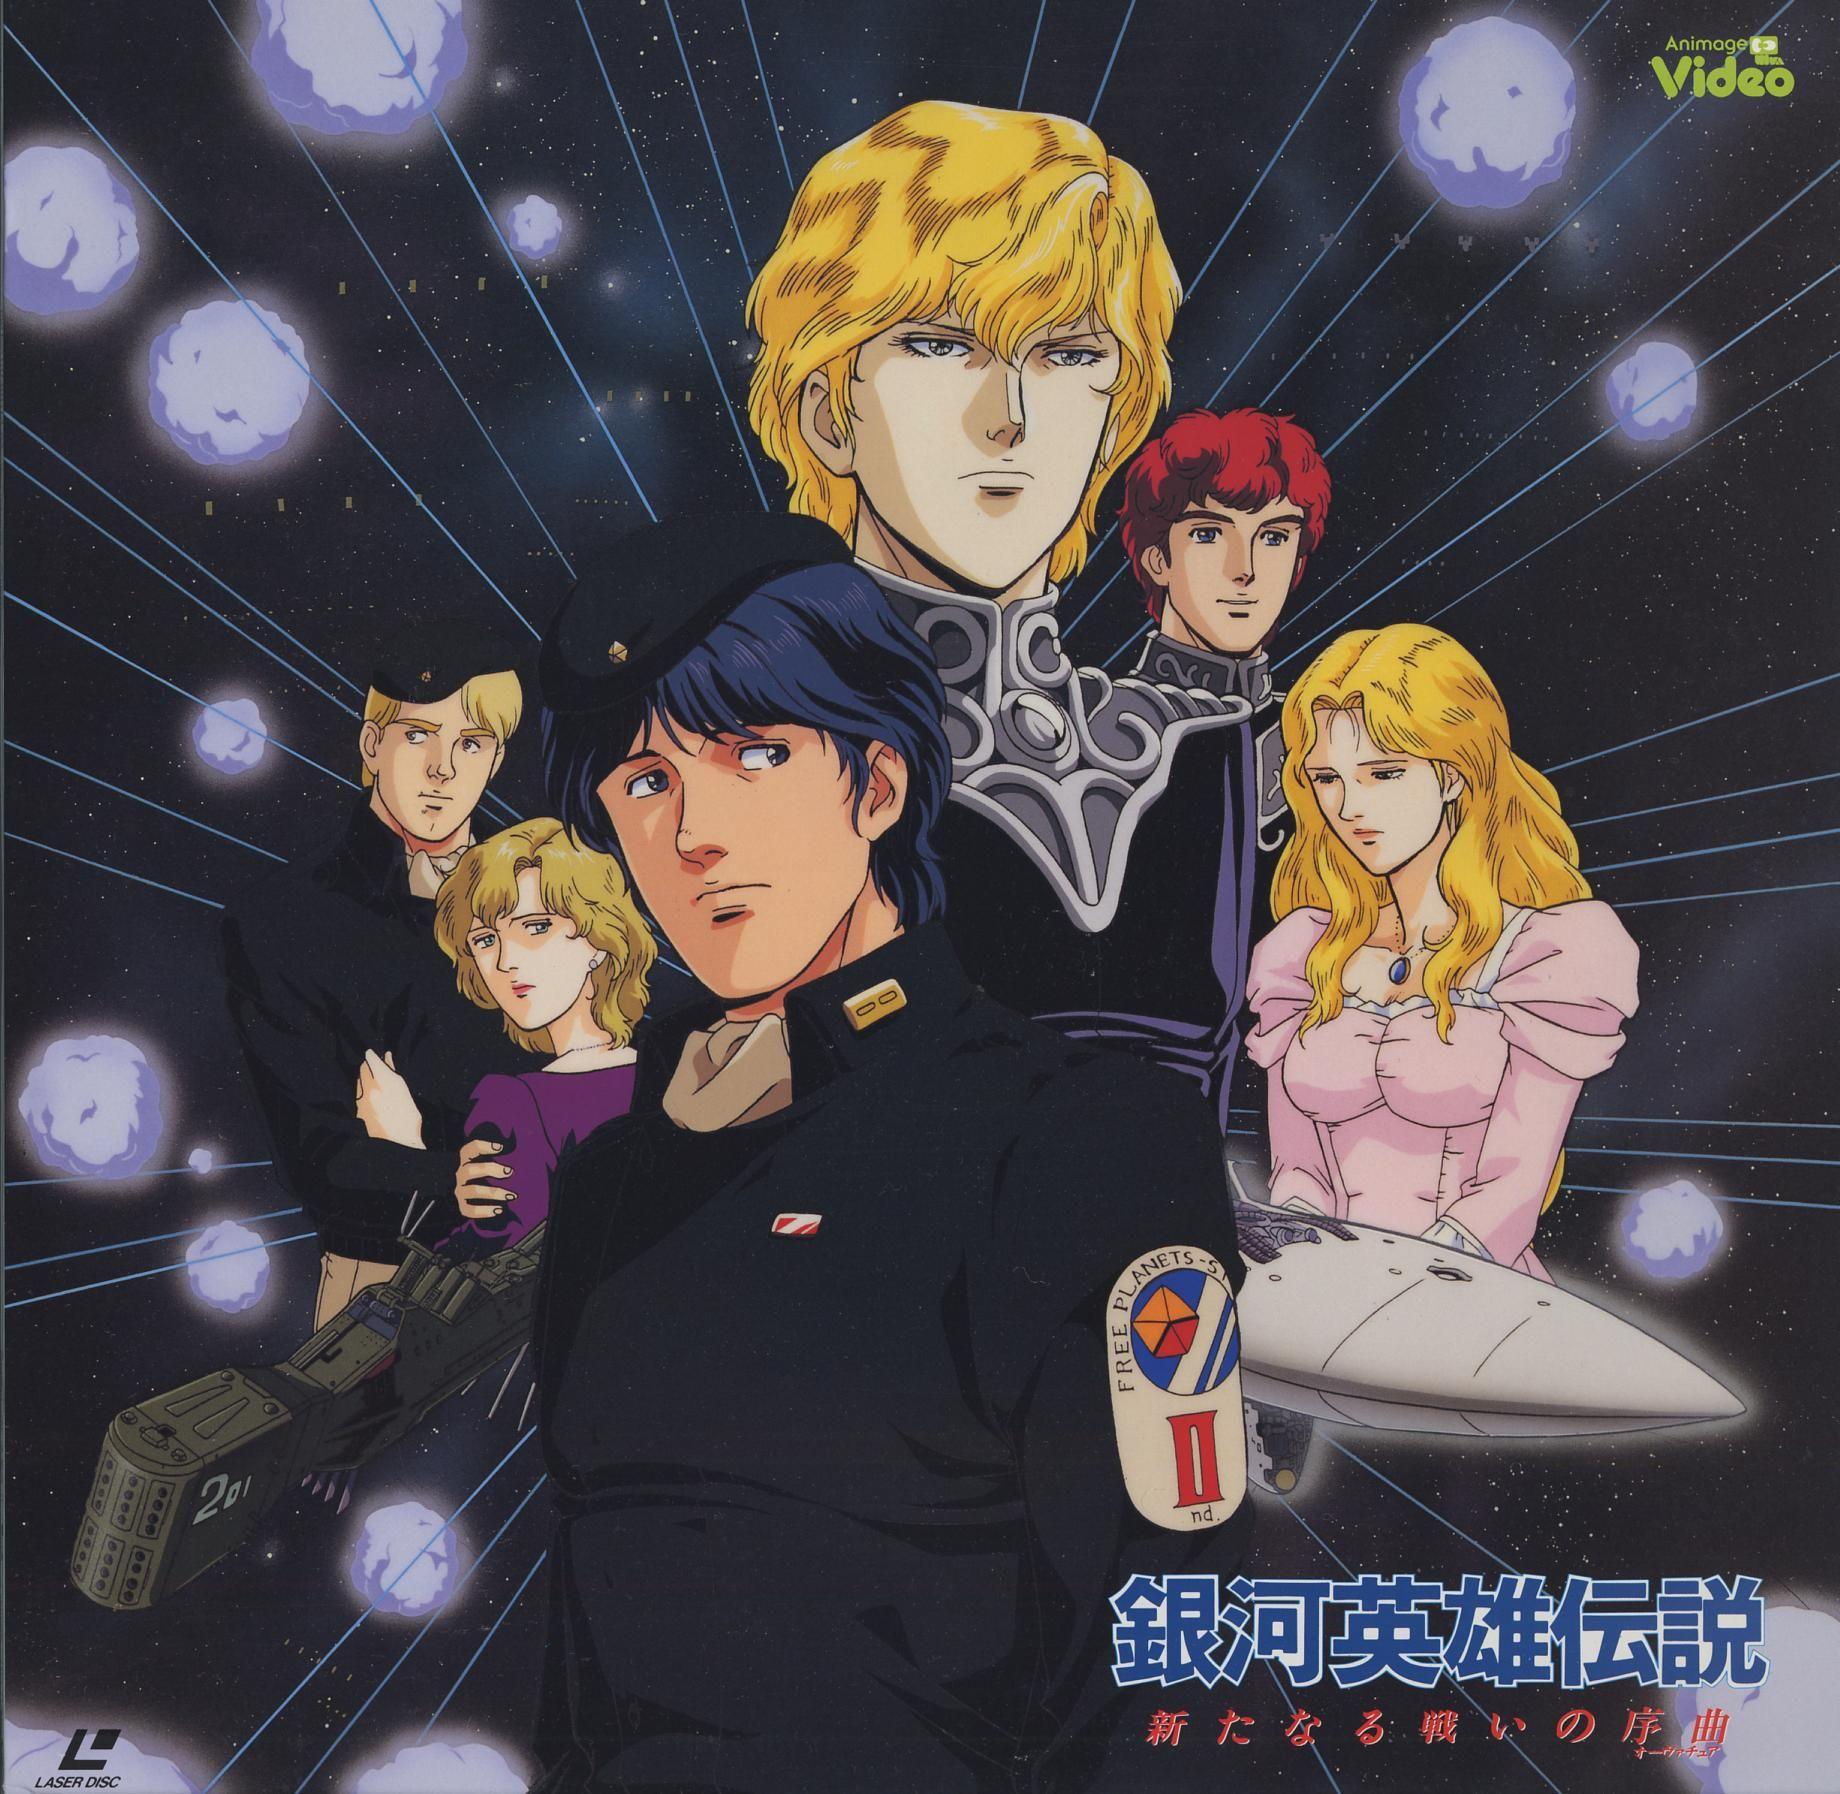 Legend of the Galactic Heroes Galactic heroes, Anime